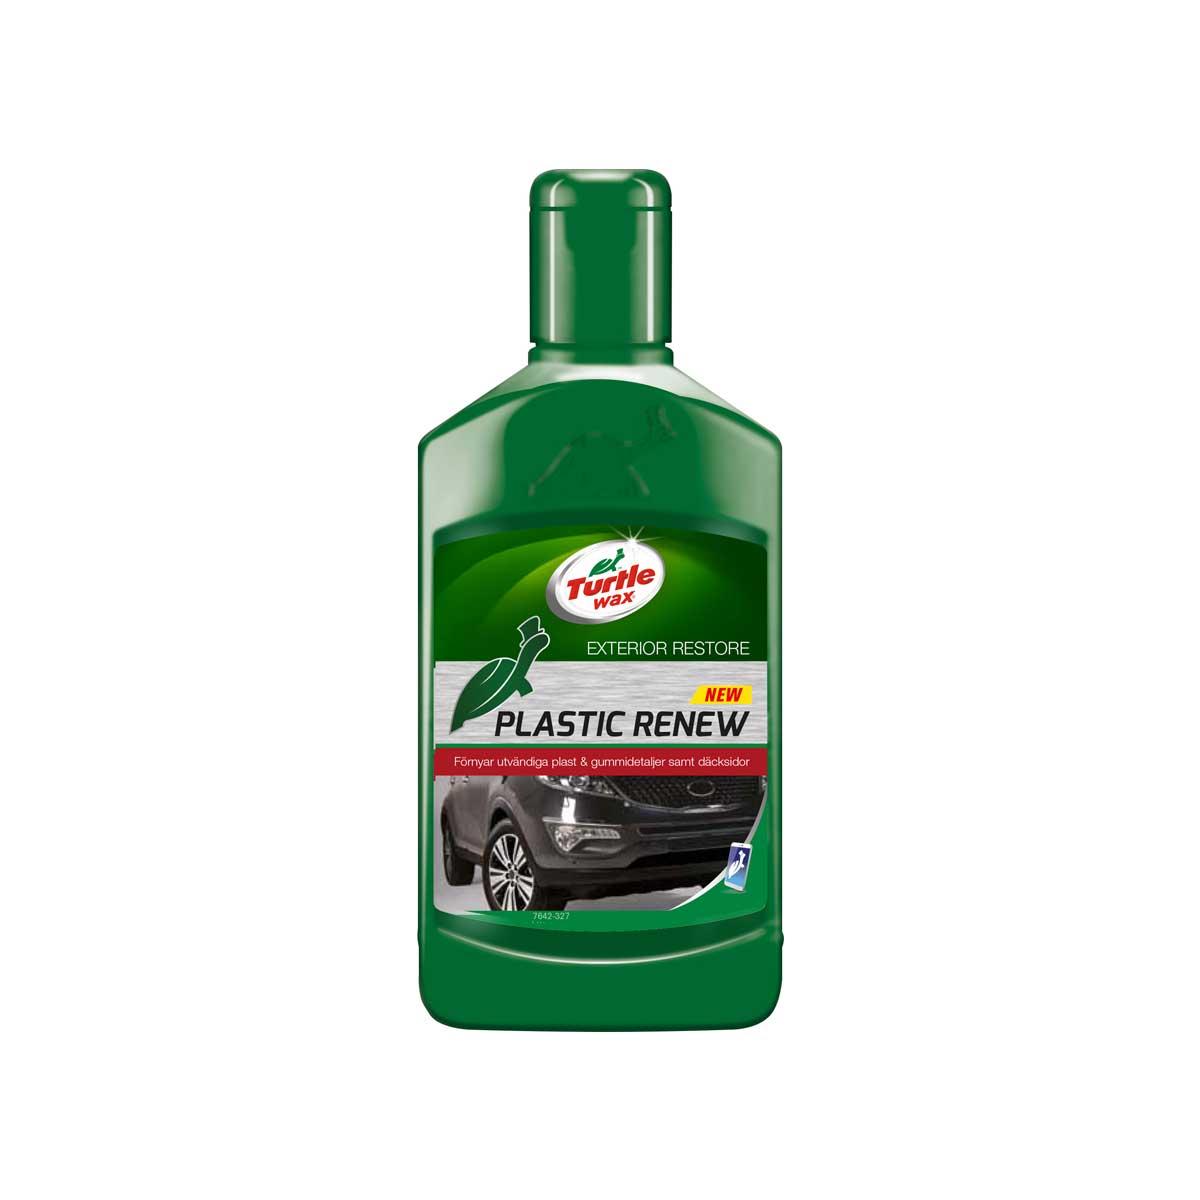 Plastbehandling Turtle Wax Plastic Renew, 300 ml